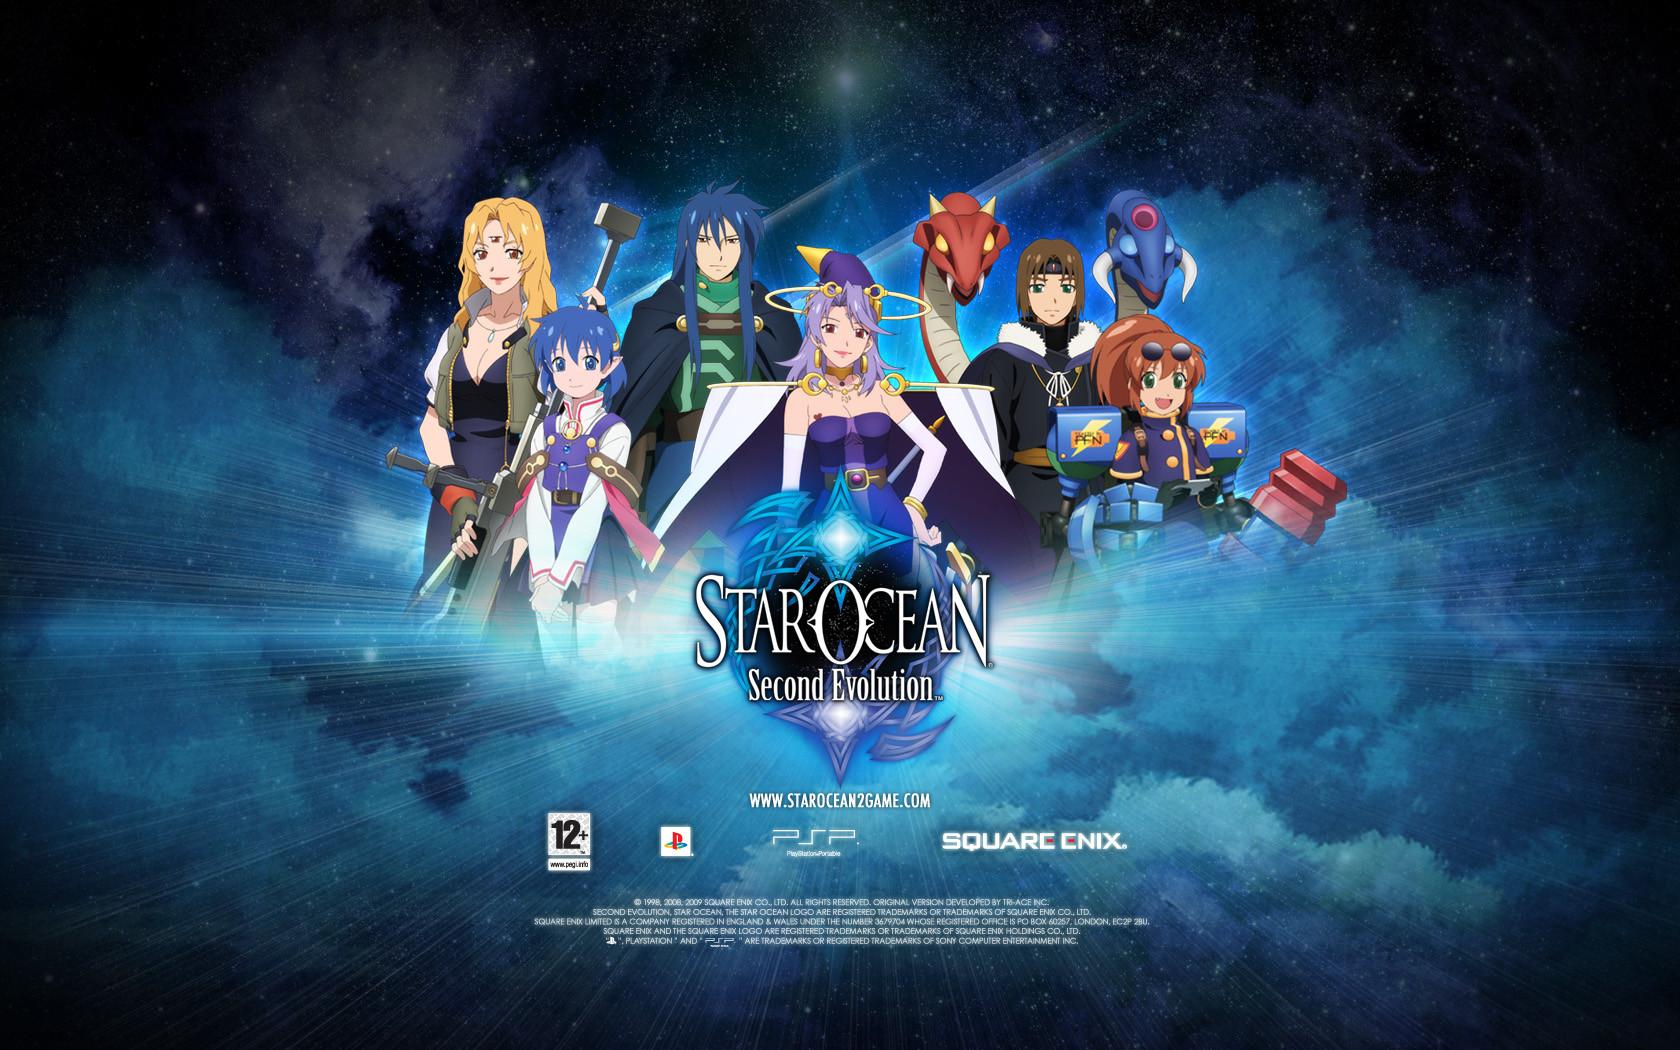 Second Evolution PC - Star Ocean Universe